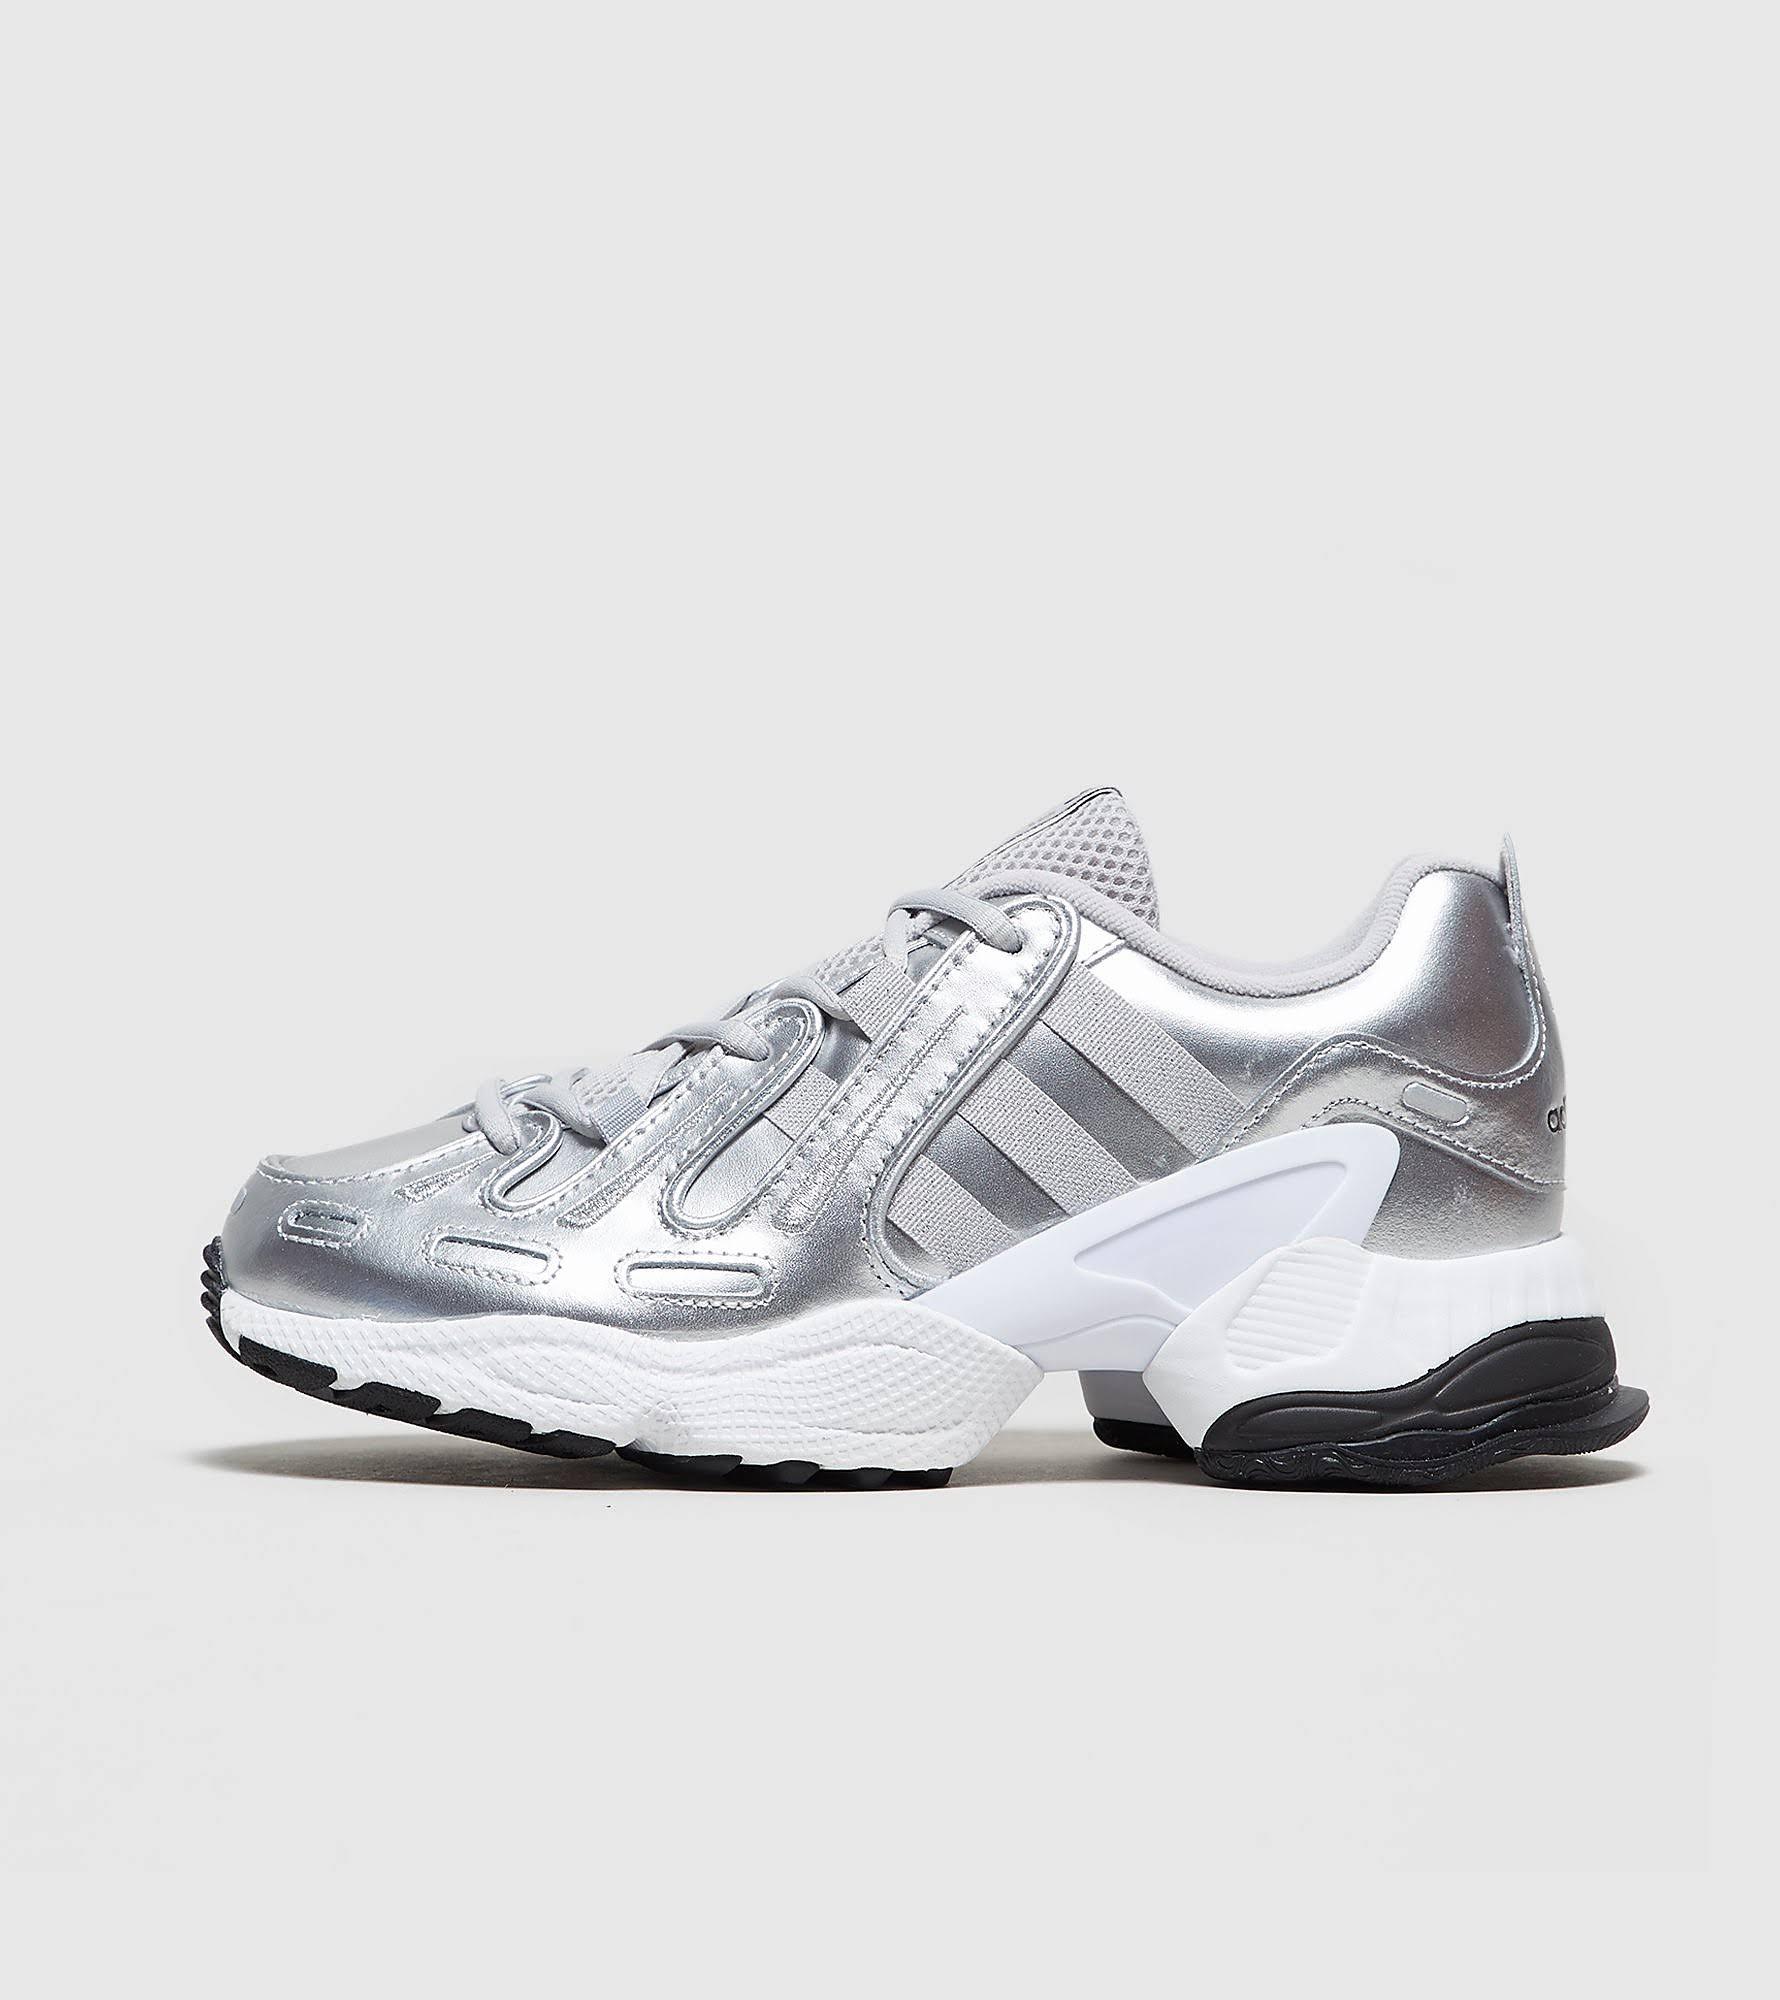 Adidas Originals EQT Gazelle Women's, Silver